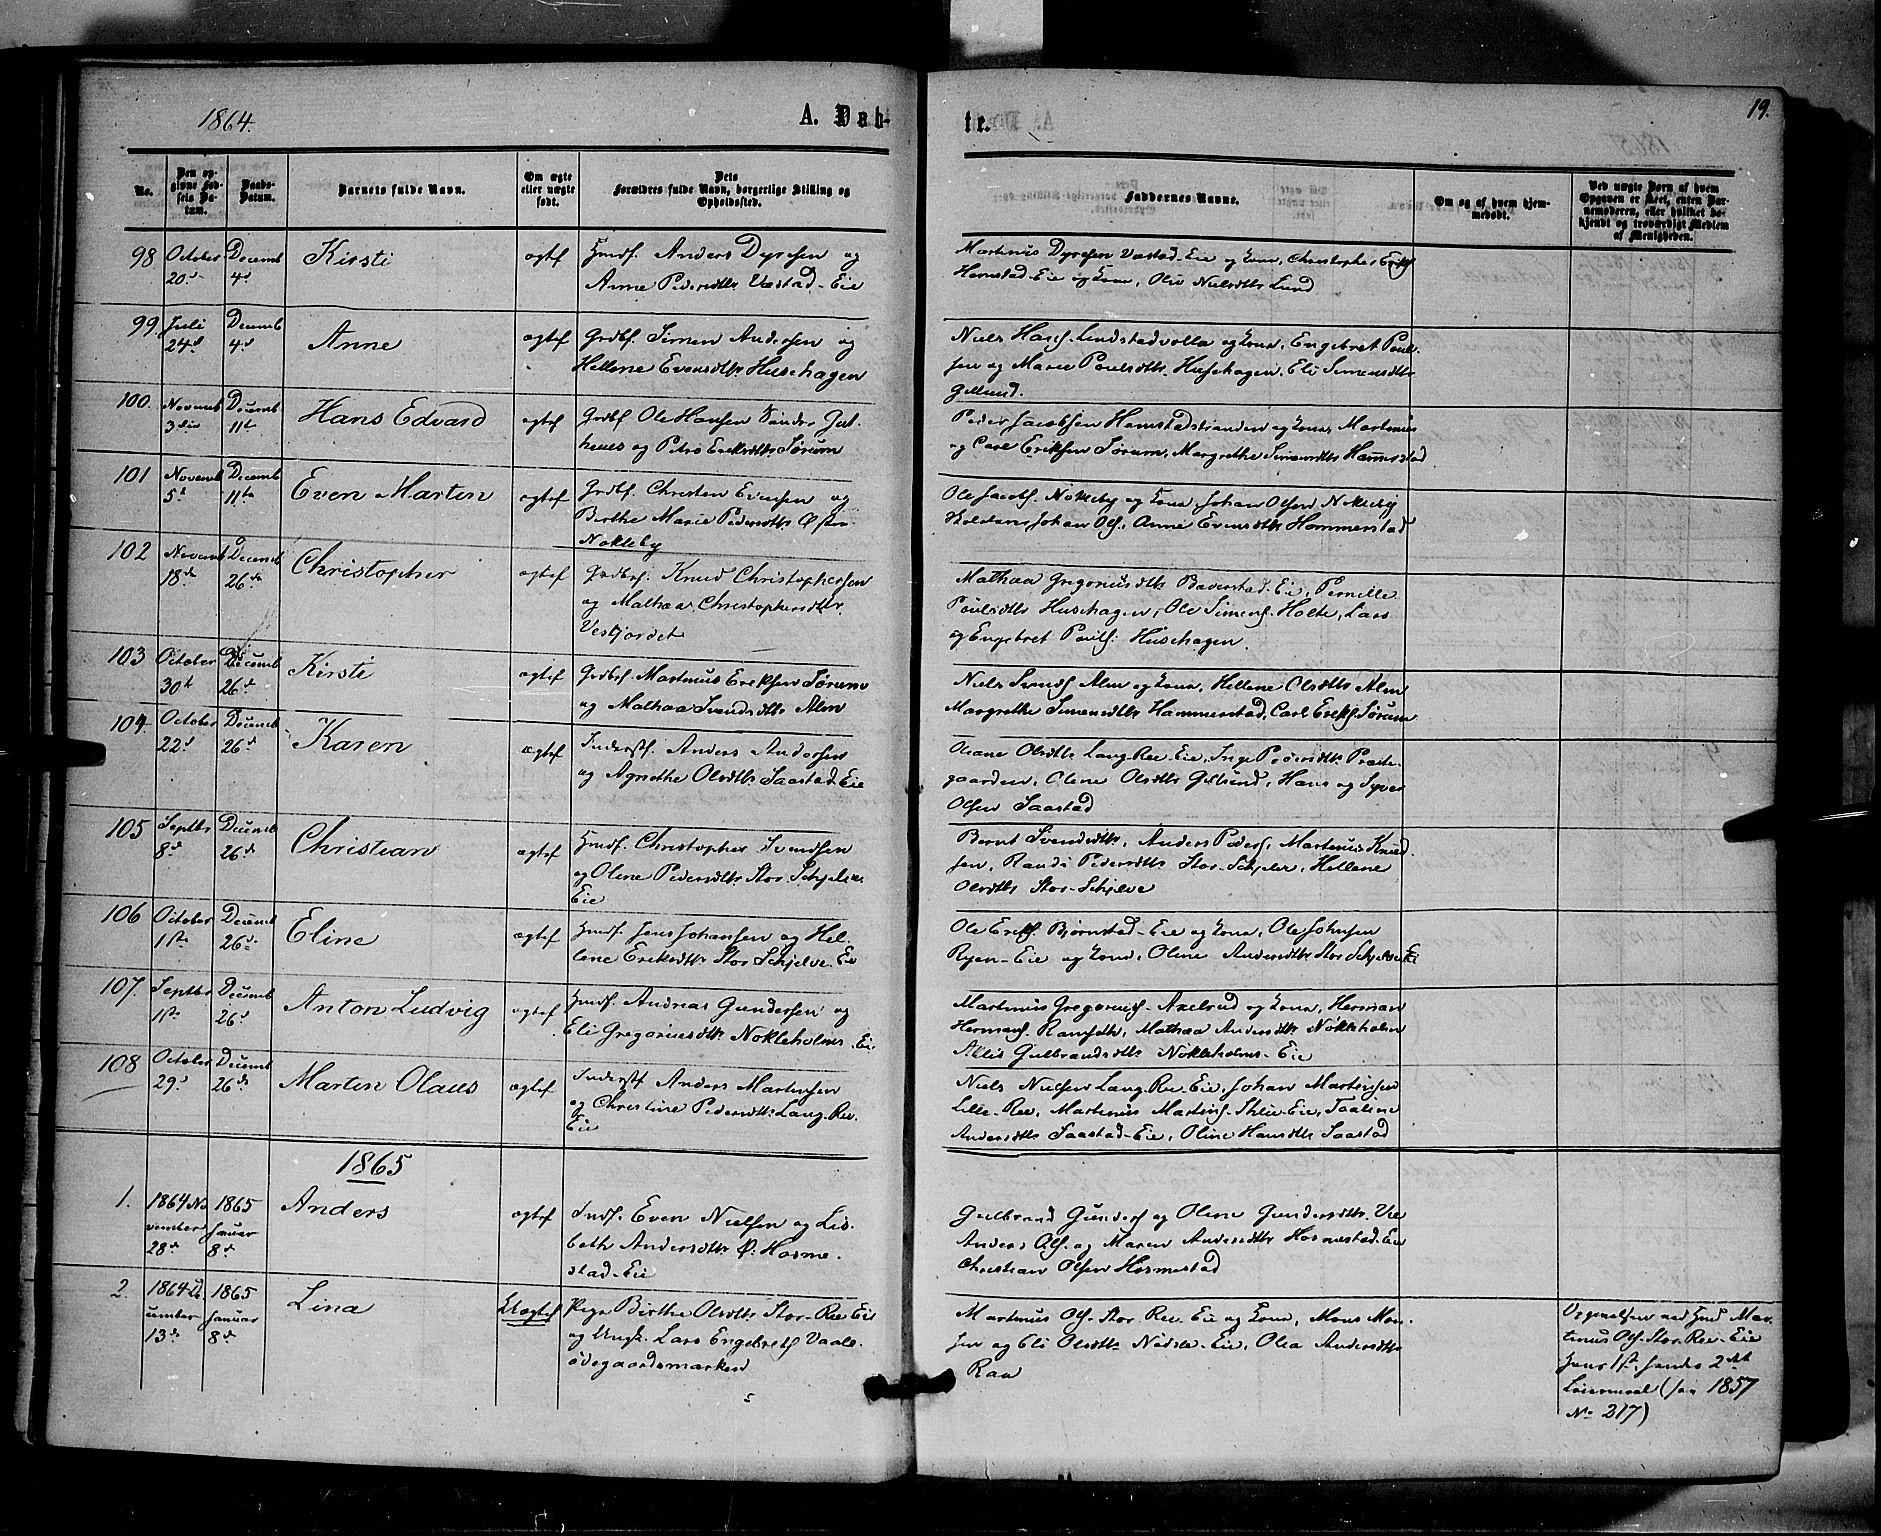 SAH, Stange prestekontor, K/L0013: Ministerialbok nr. 13, 1862-1879, s. 19